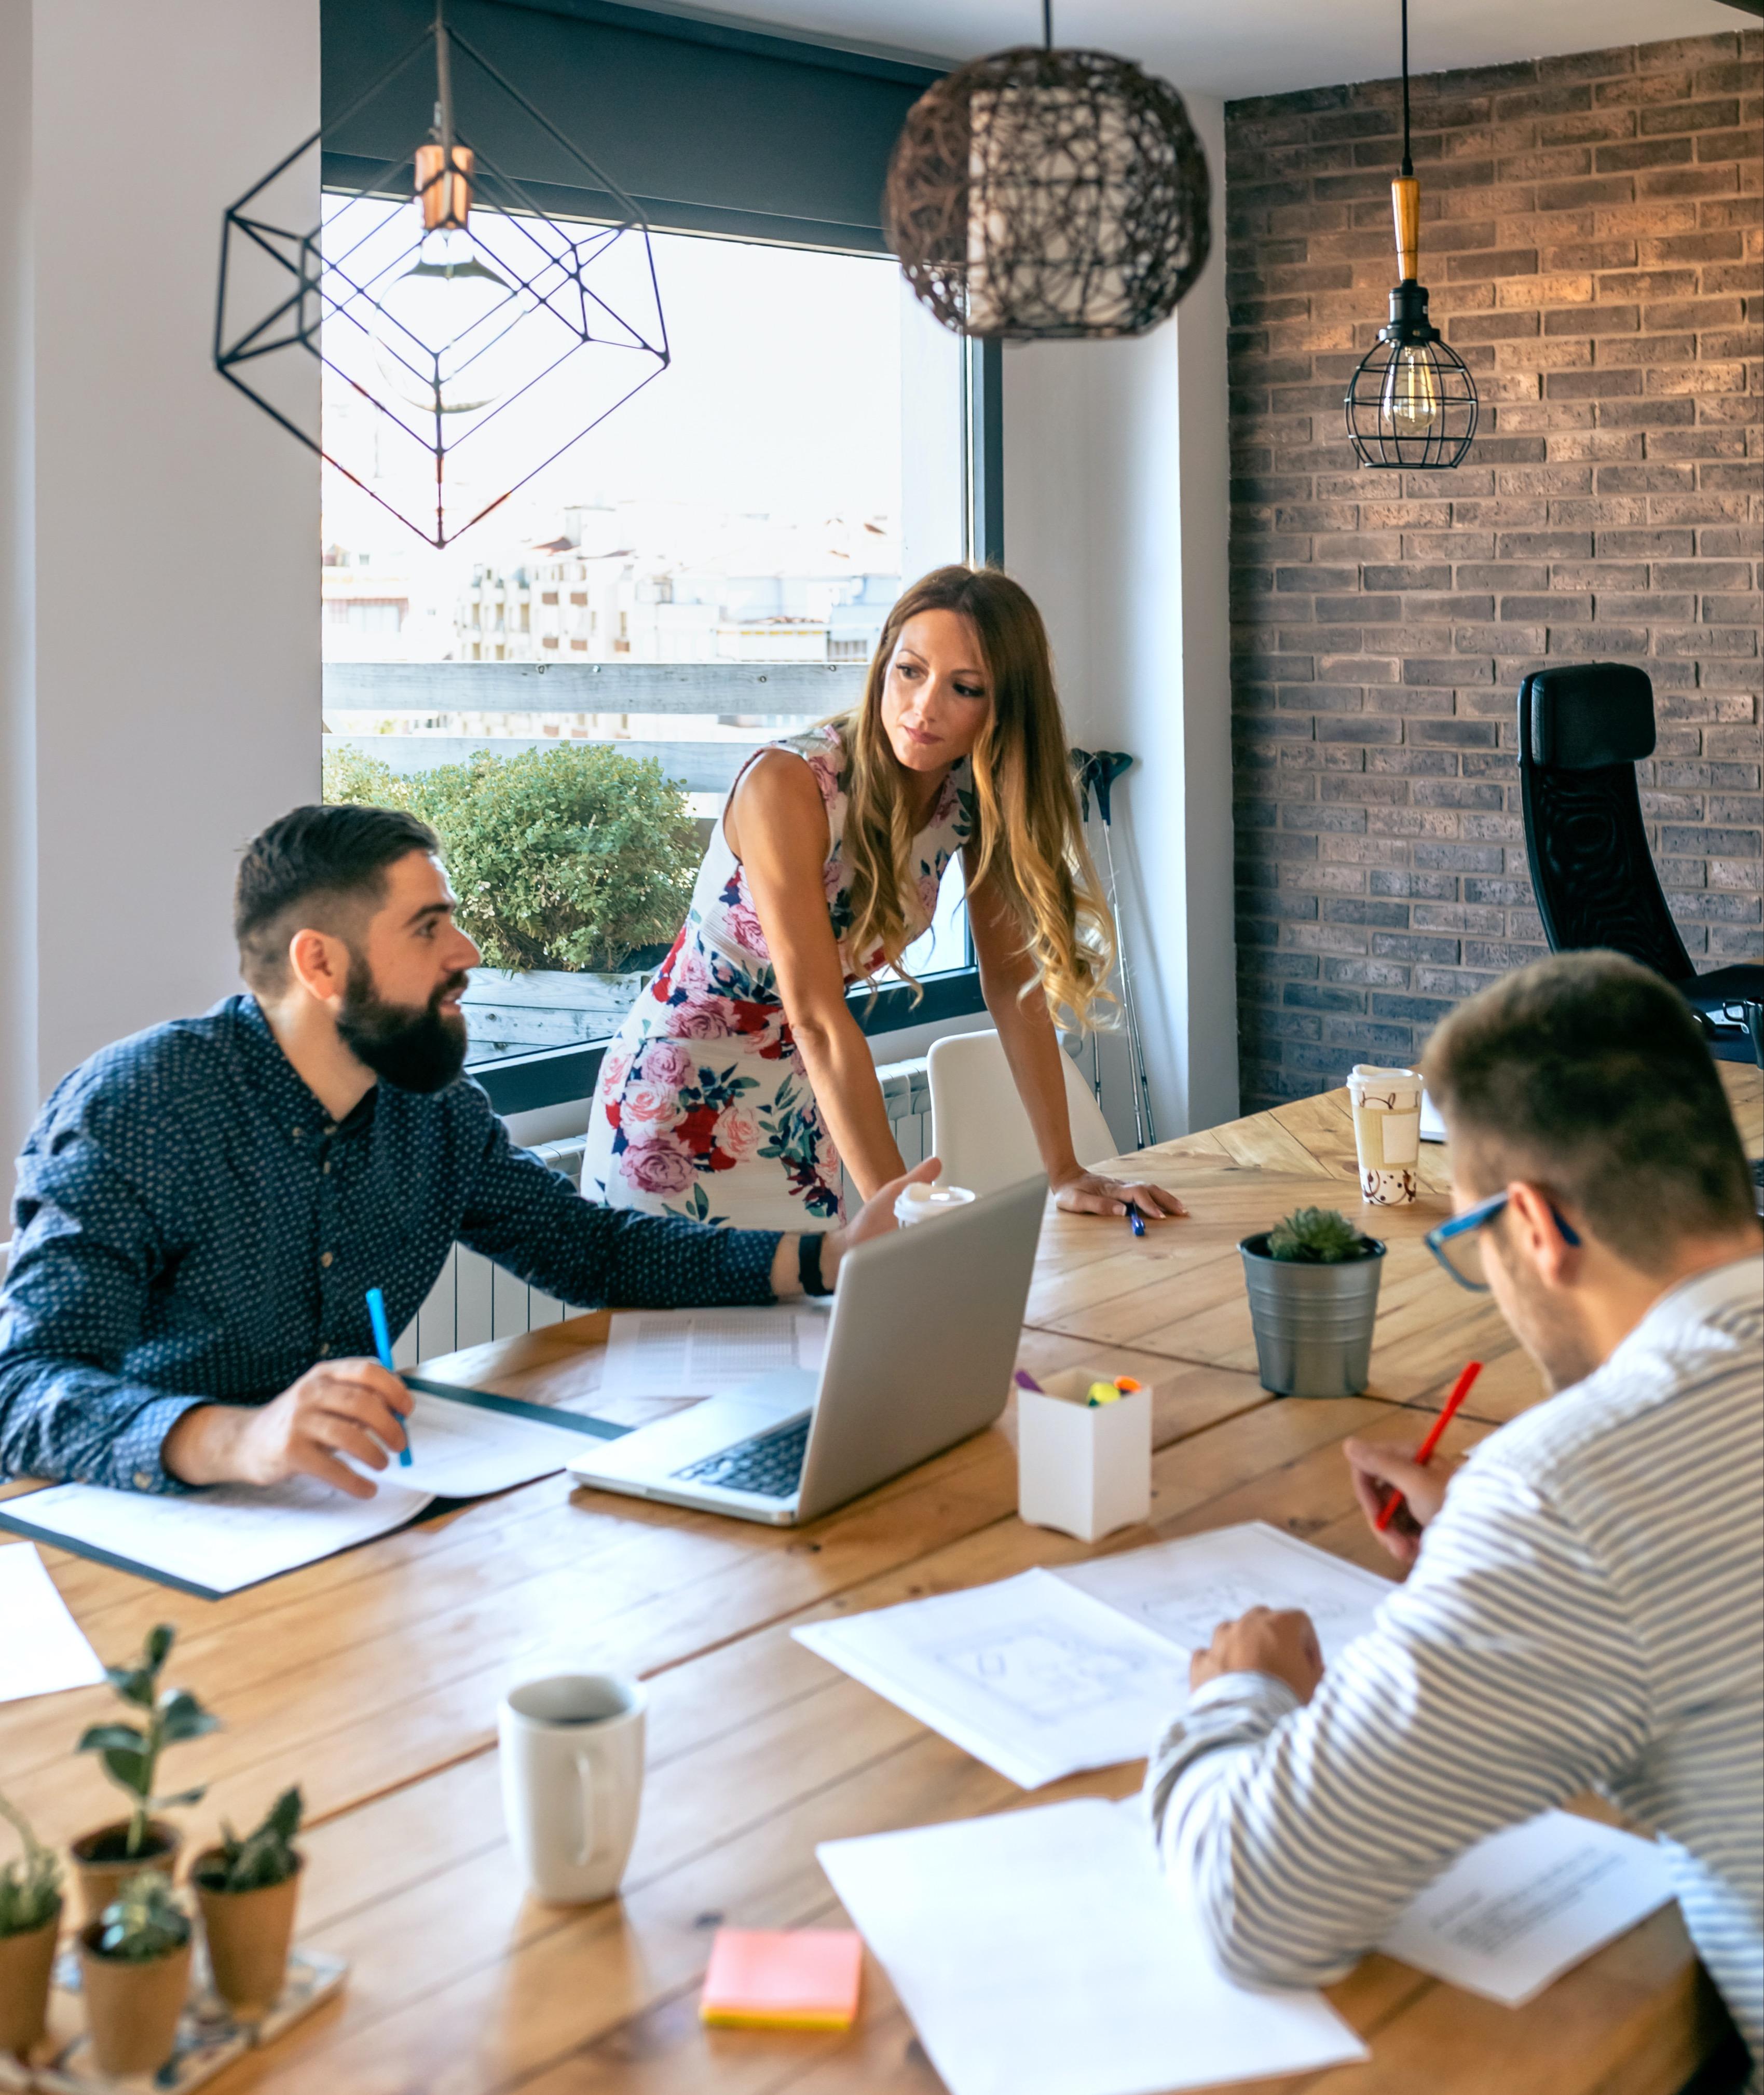 female-boss-supervising-work-meeting-JS7GAEU-1